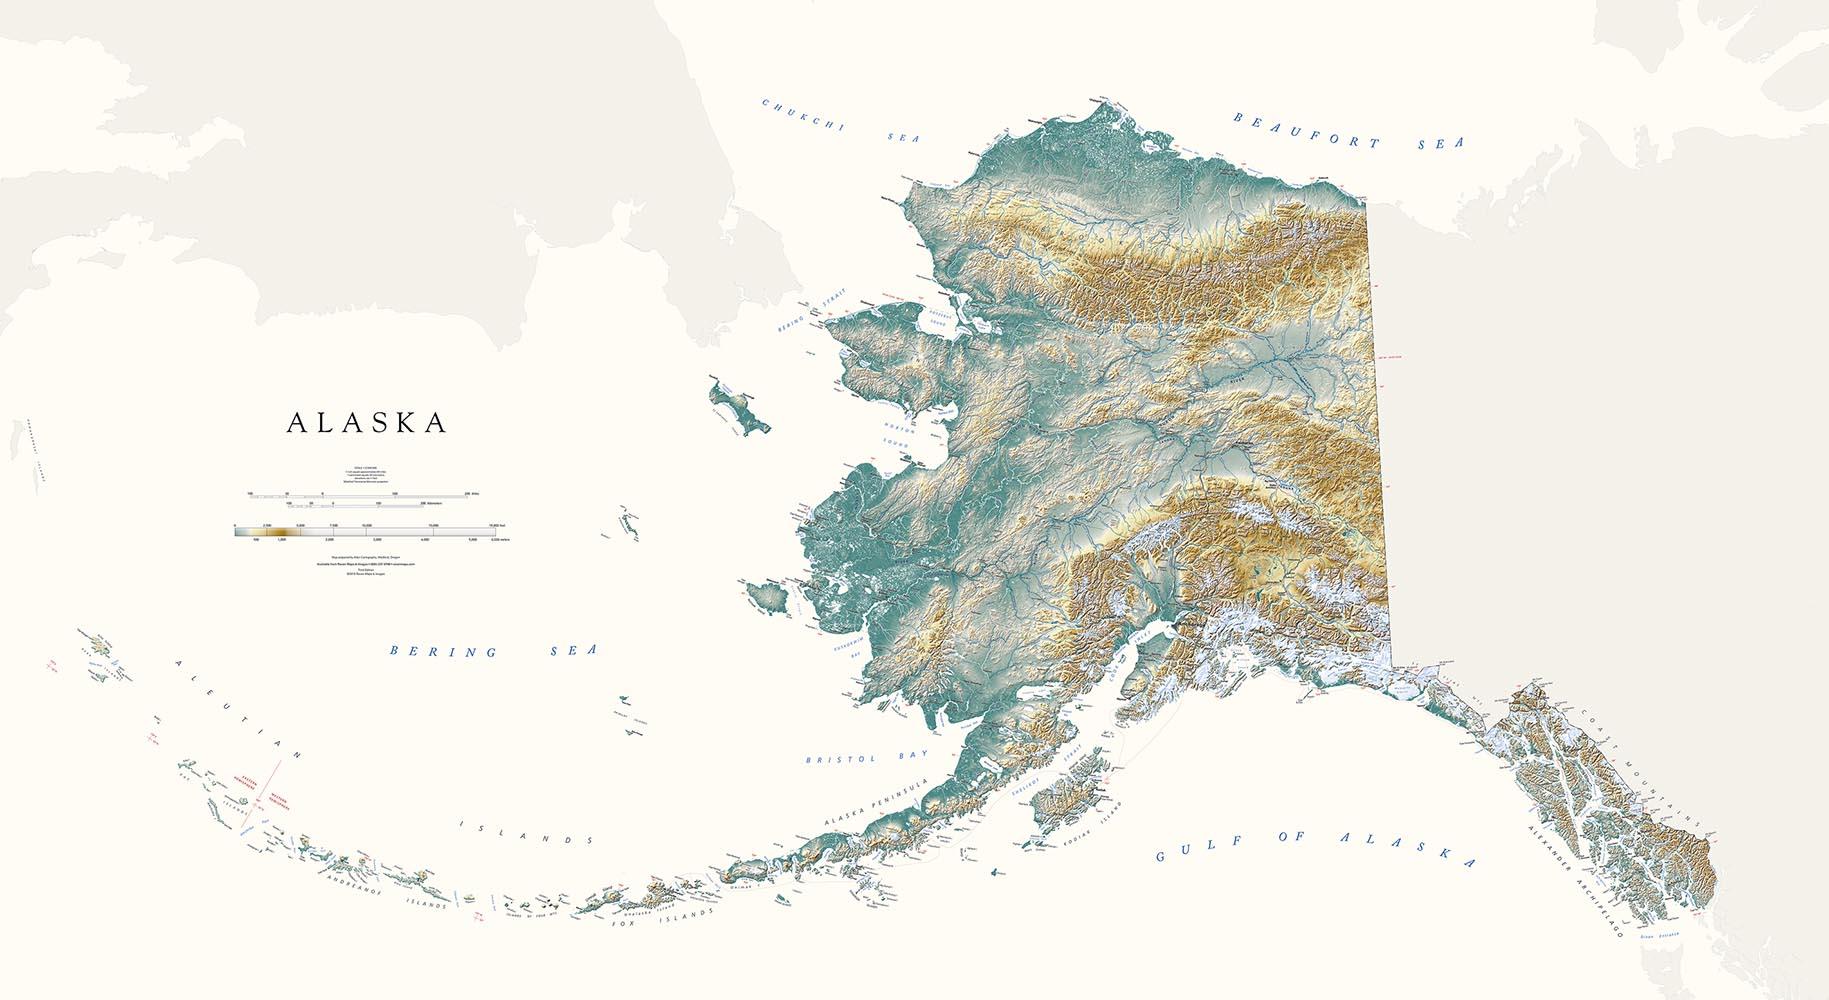 Alaska! Map Alaska on aleutian islands map, inside passage map, alabama map, russia map, california map, colorado map, minnesota map, kodiak island map, wyoming map, hawaiian islands map, nova scotia map, north carolina map, arkansas map, connecticut map, yukon map, indiana map, texas map, arizona map, new york map, illinois map, anchorage map, new mexico map, hawaii map, georgia map, north dakota map, idaho map, pacific map, delaware map, louisiana map, florida map, canada map, michigan map, iowa map, bc map,